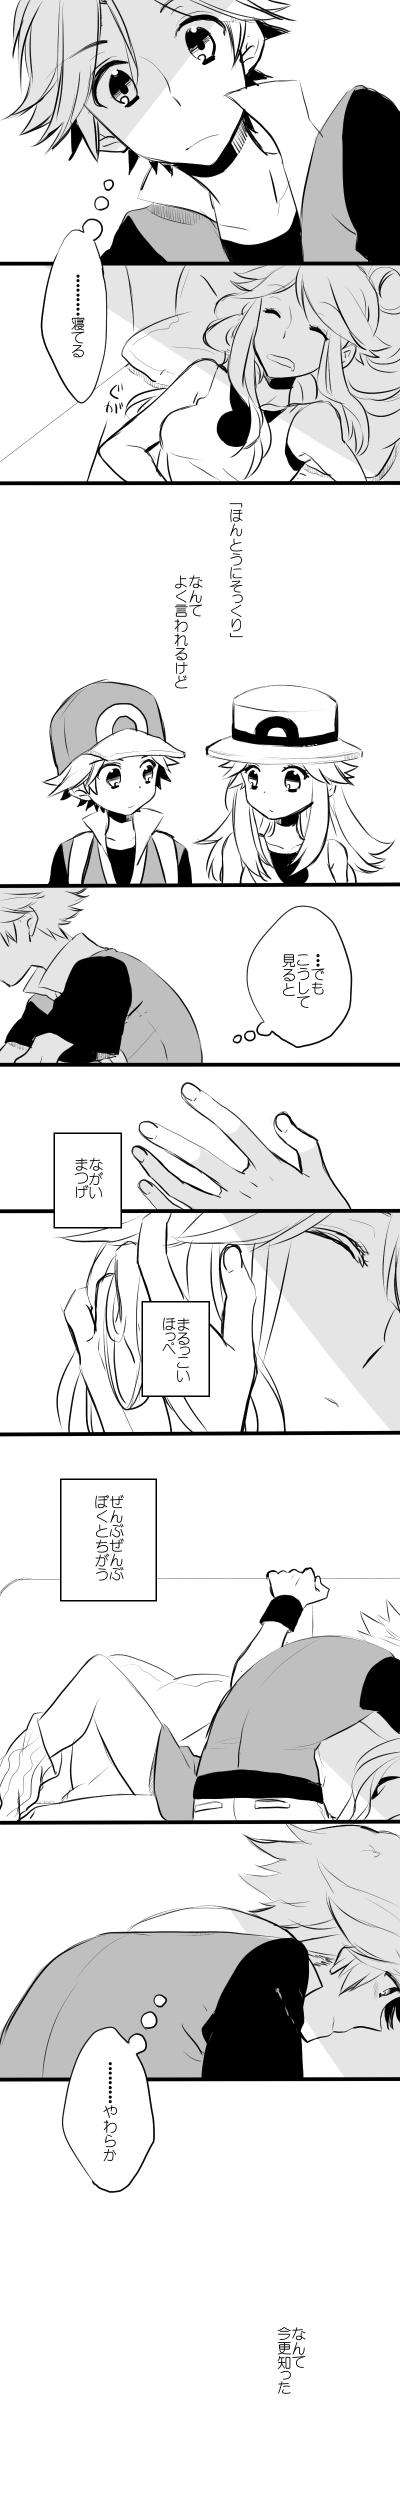 Tags: Anime, Pokémon, Red (Pokémon FireRed and LeafGreen), Leaf (Pokémon), Red (Pokémon), Pixiv, Translation Request, Comic